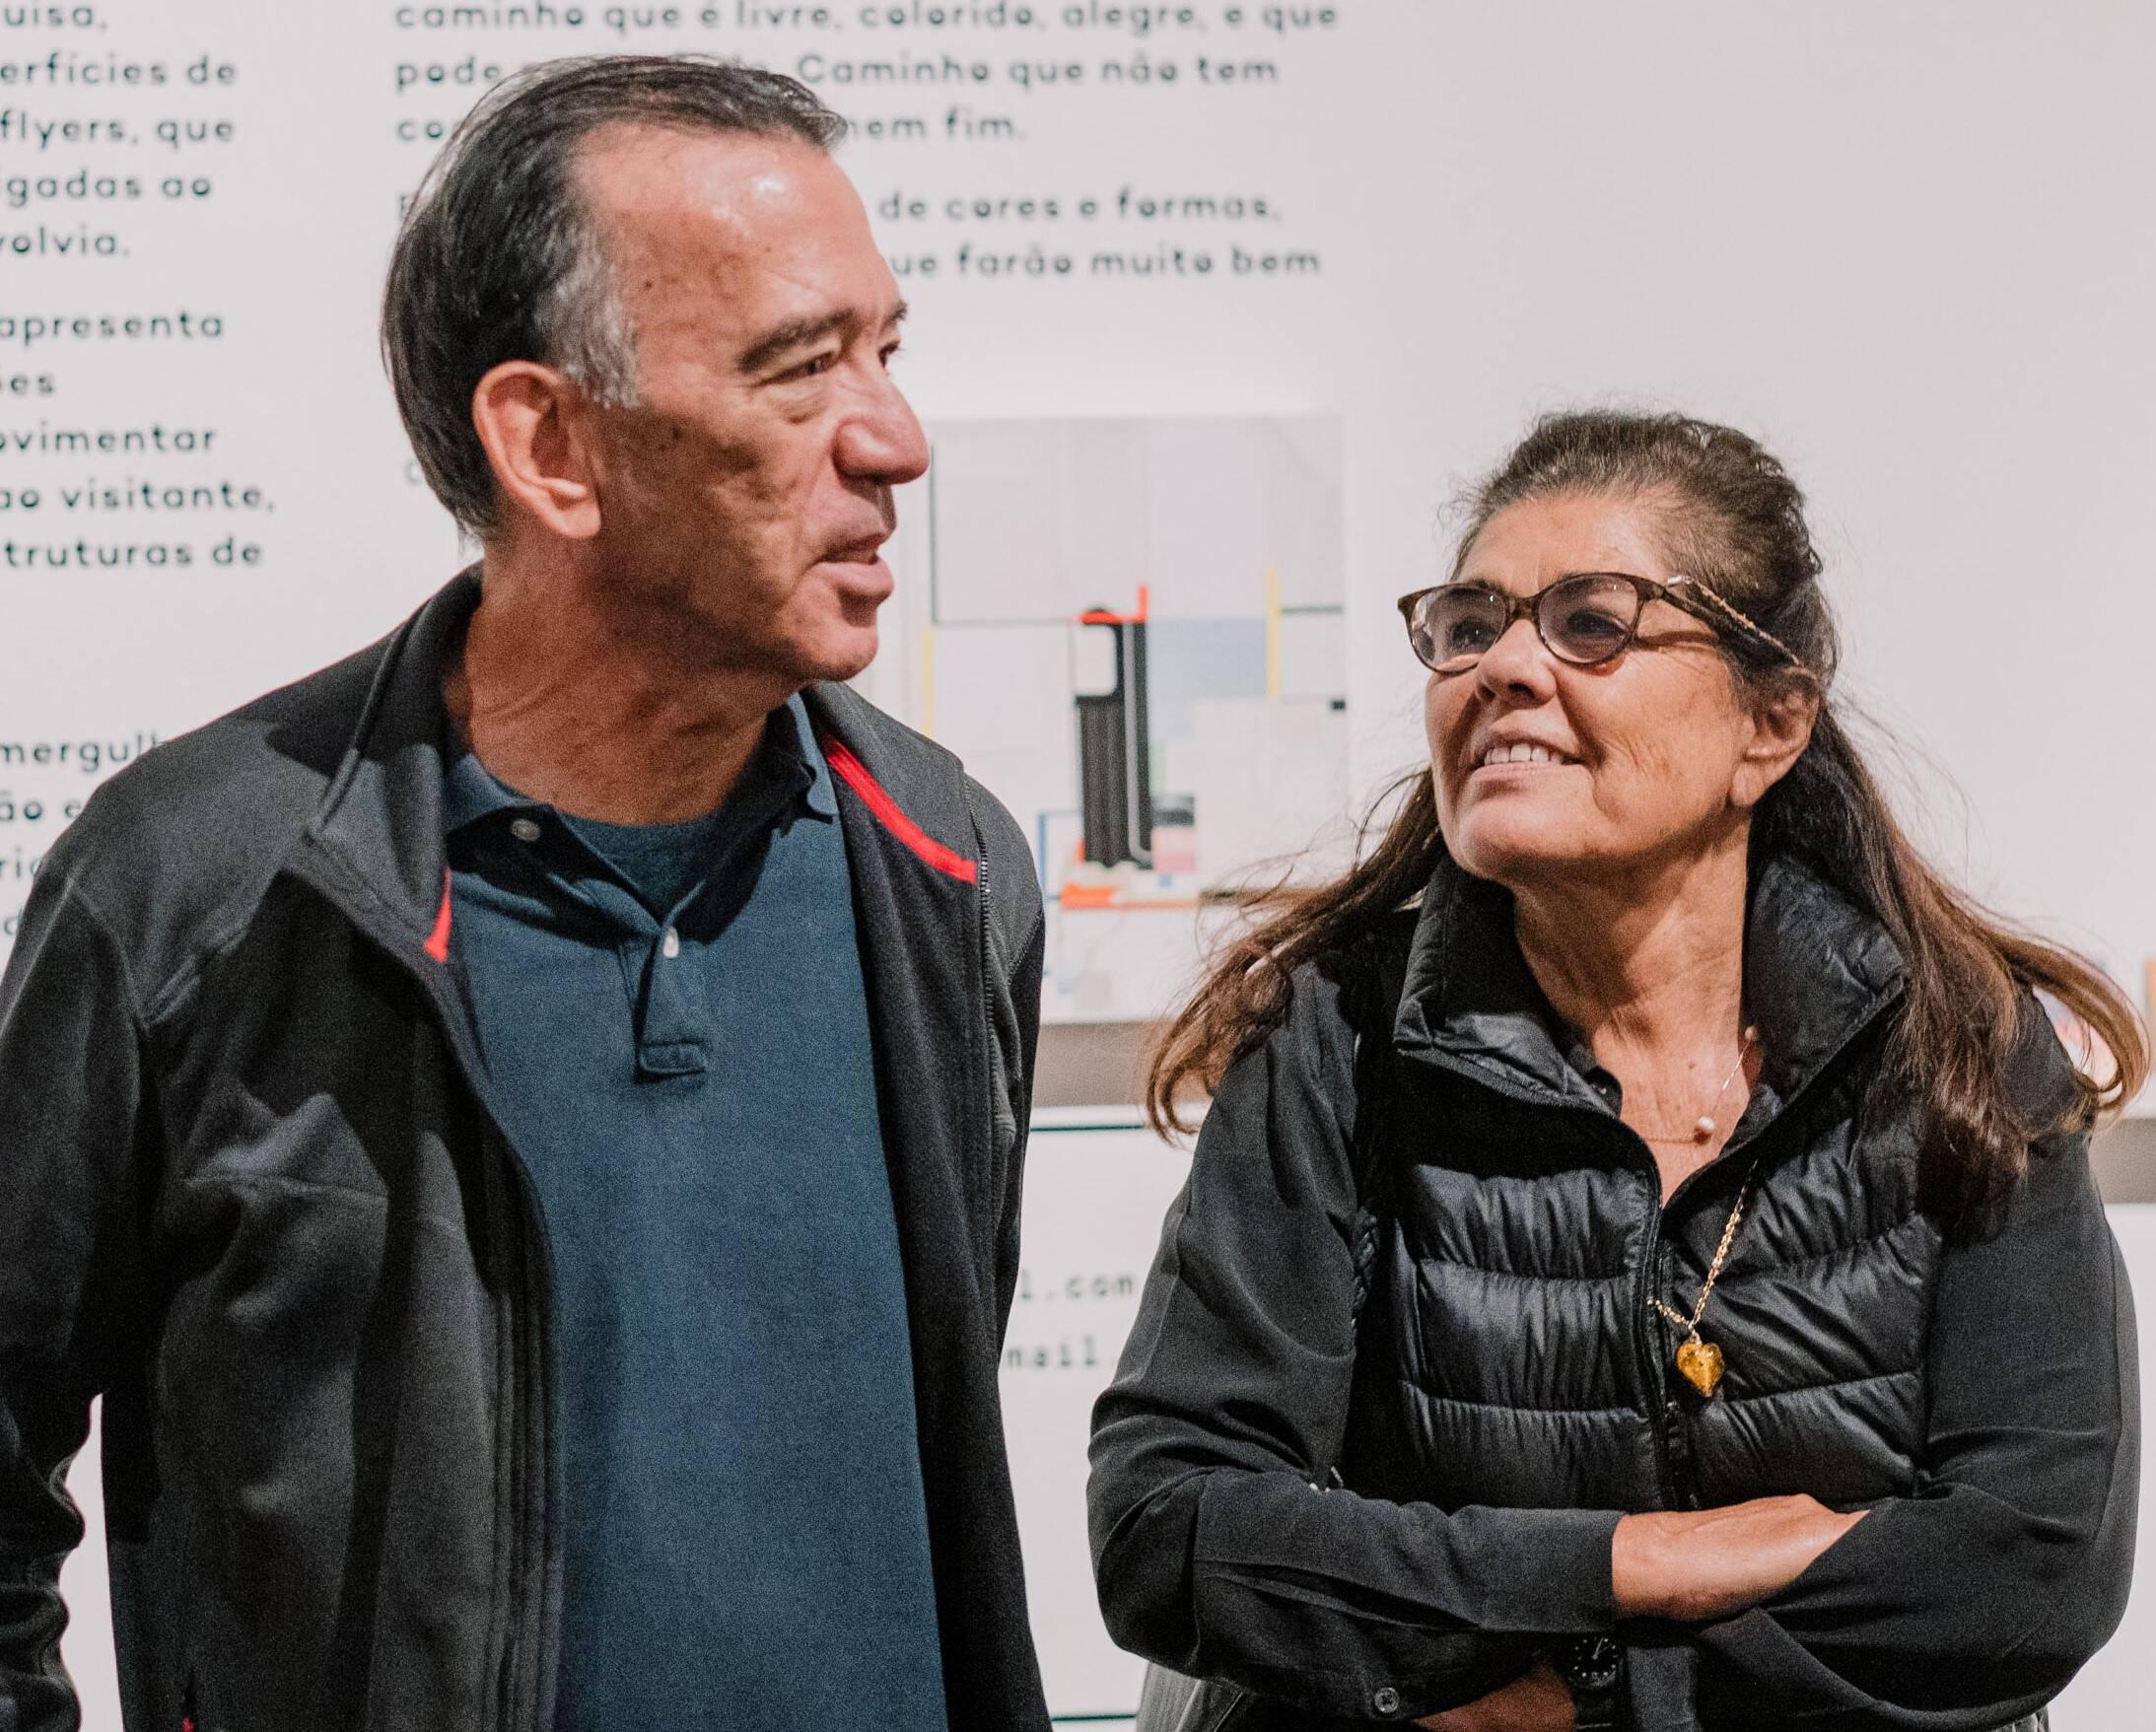 Antonio leite Garcia e Bia Borges  /Foto: Tulio Thomé